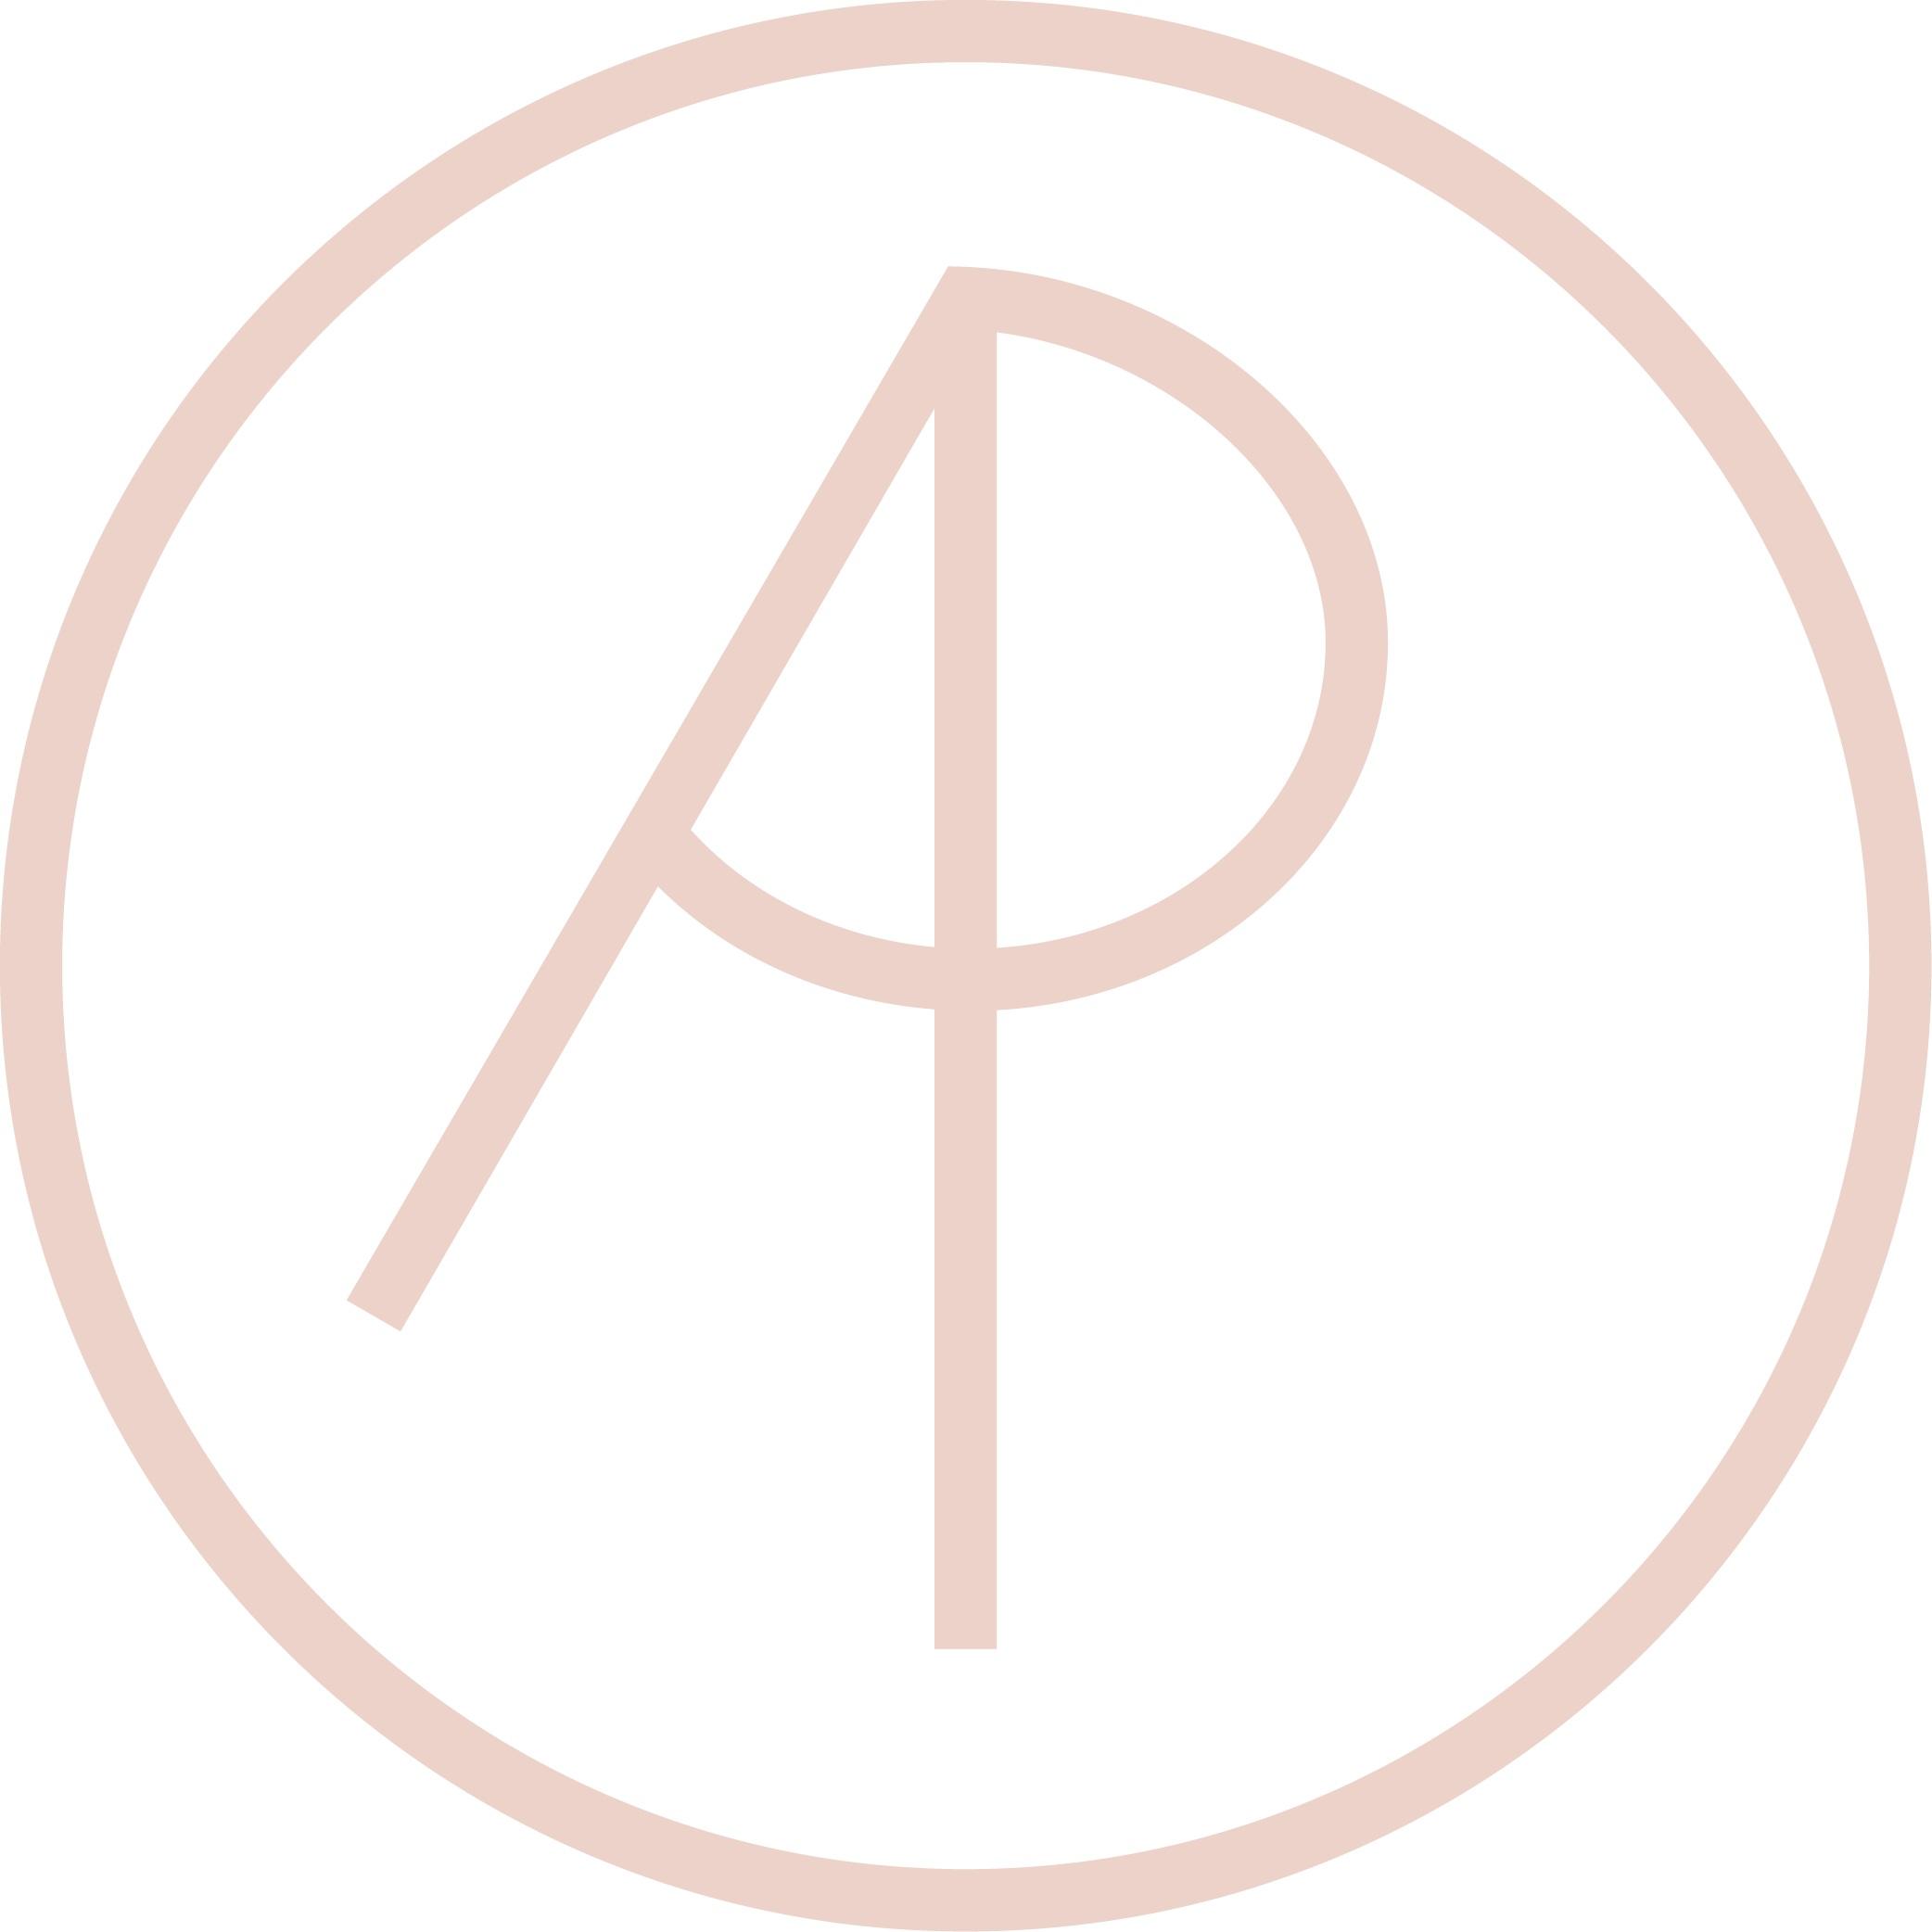 ACROPARK_LOGO_PINK.jpg